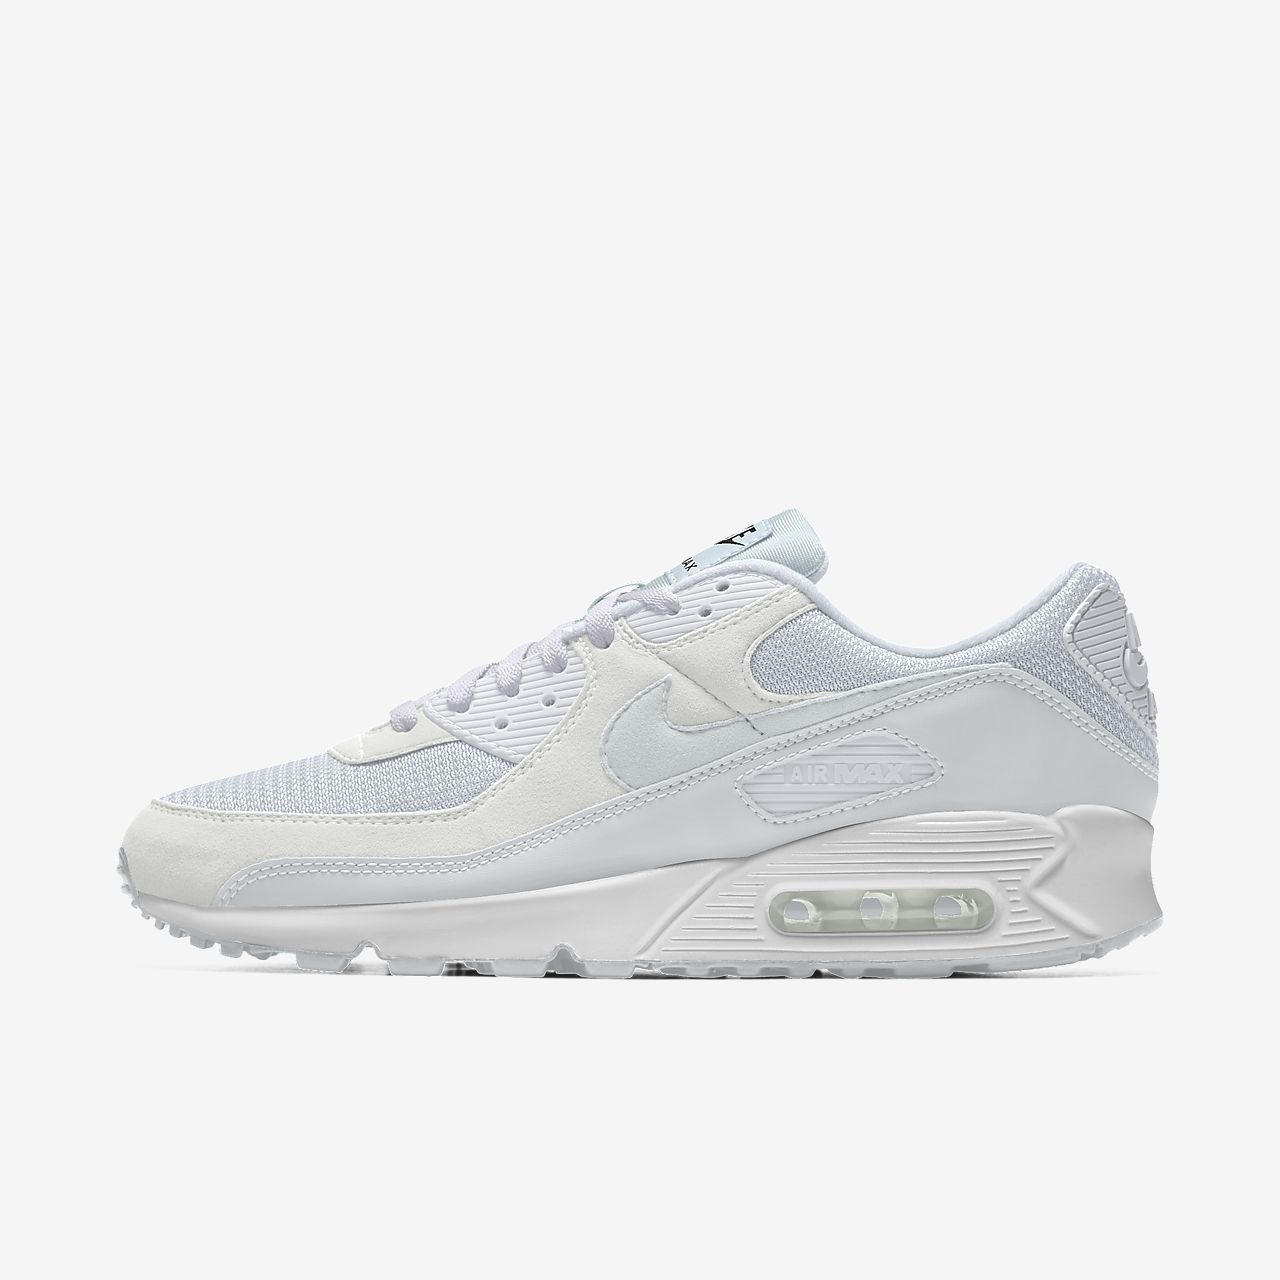 sneakers femme nike air max 90